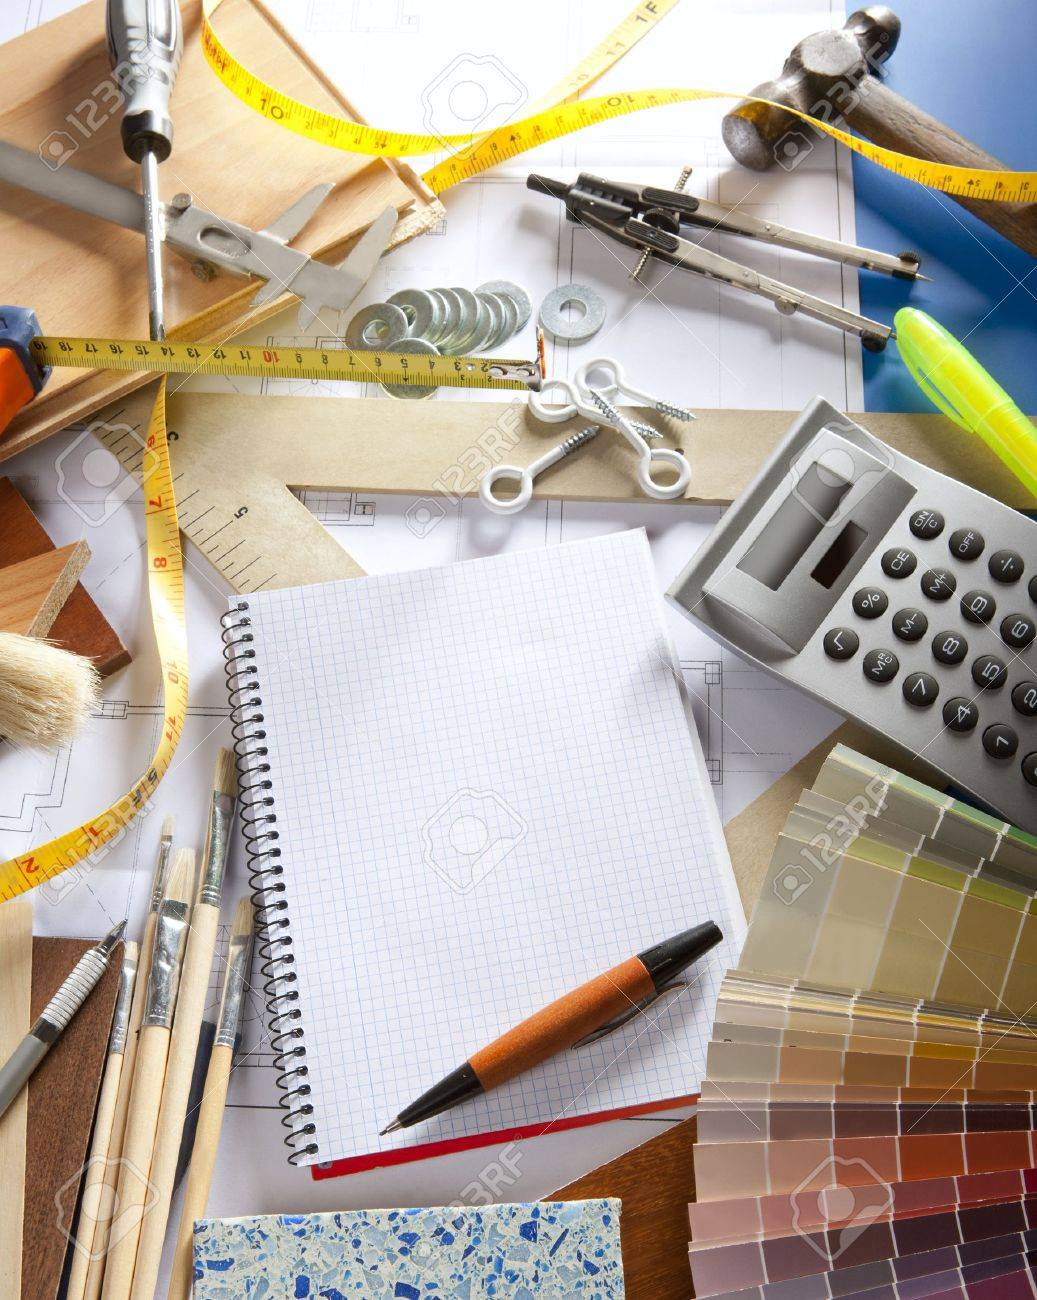 rchitect Or Interior Designer Workplace Desk With Spiral Notebook ... - ^